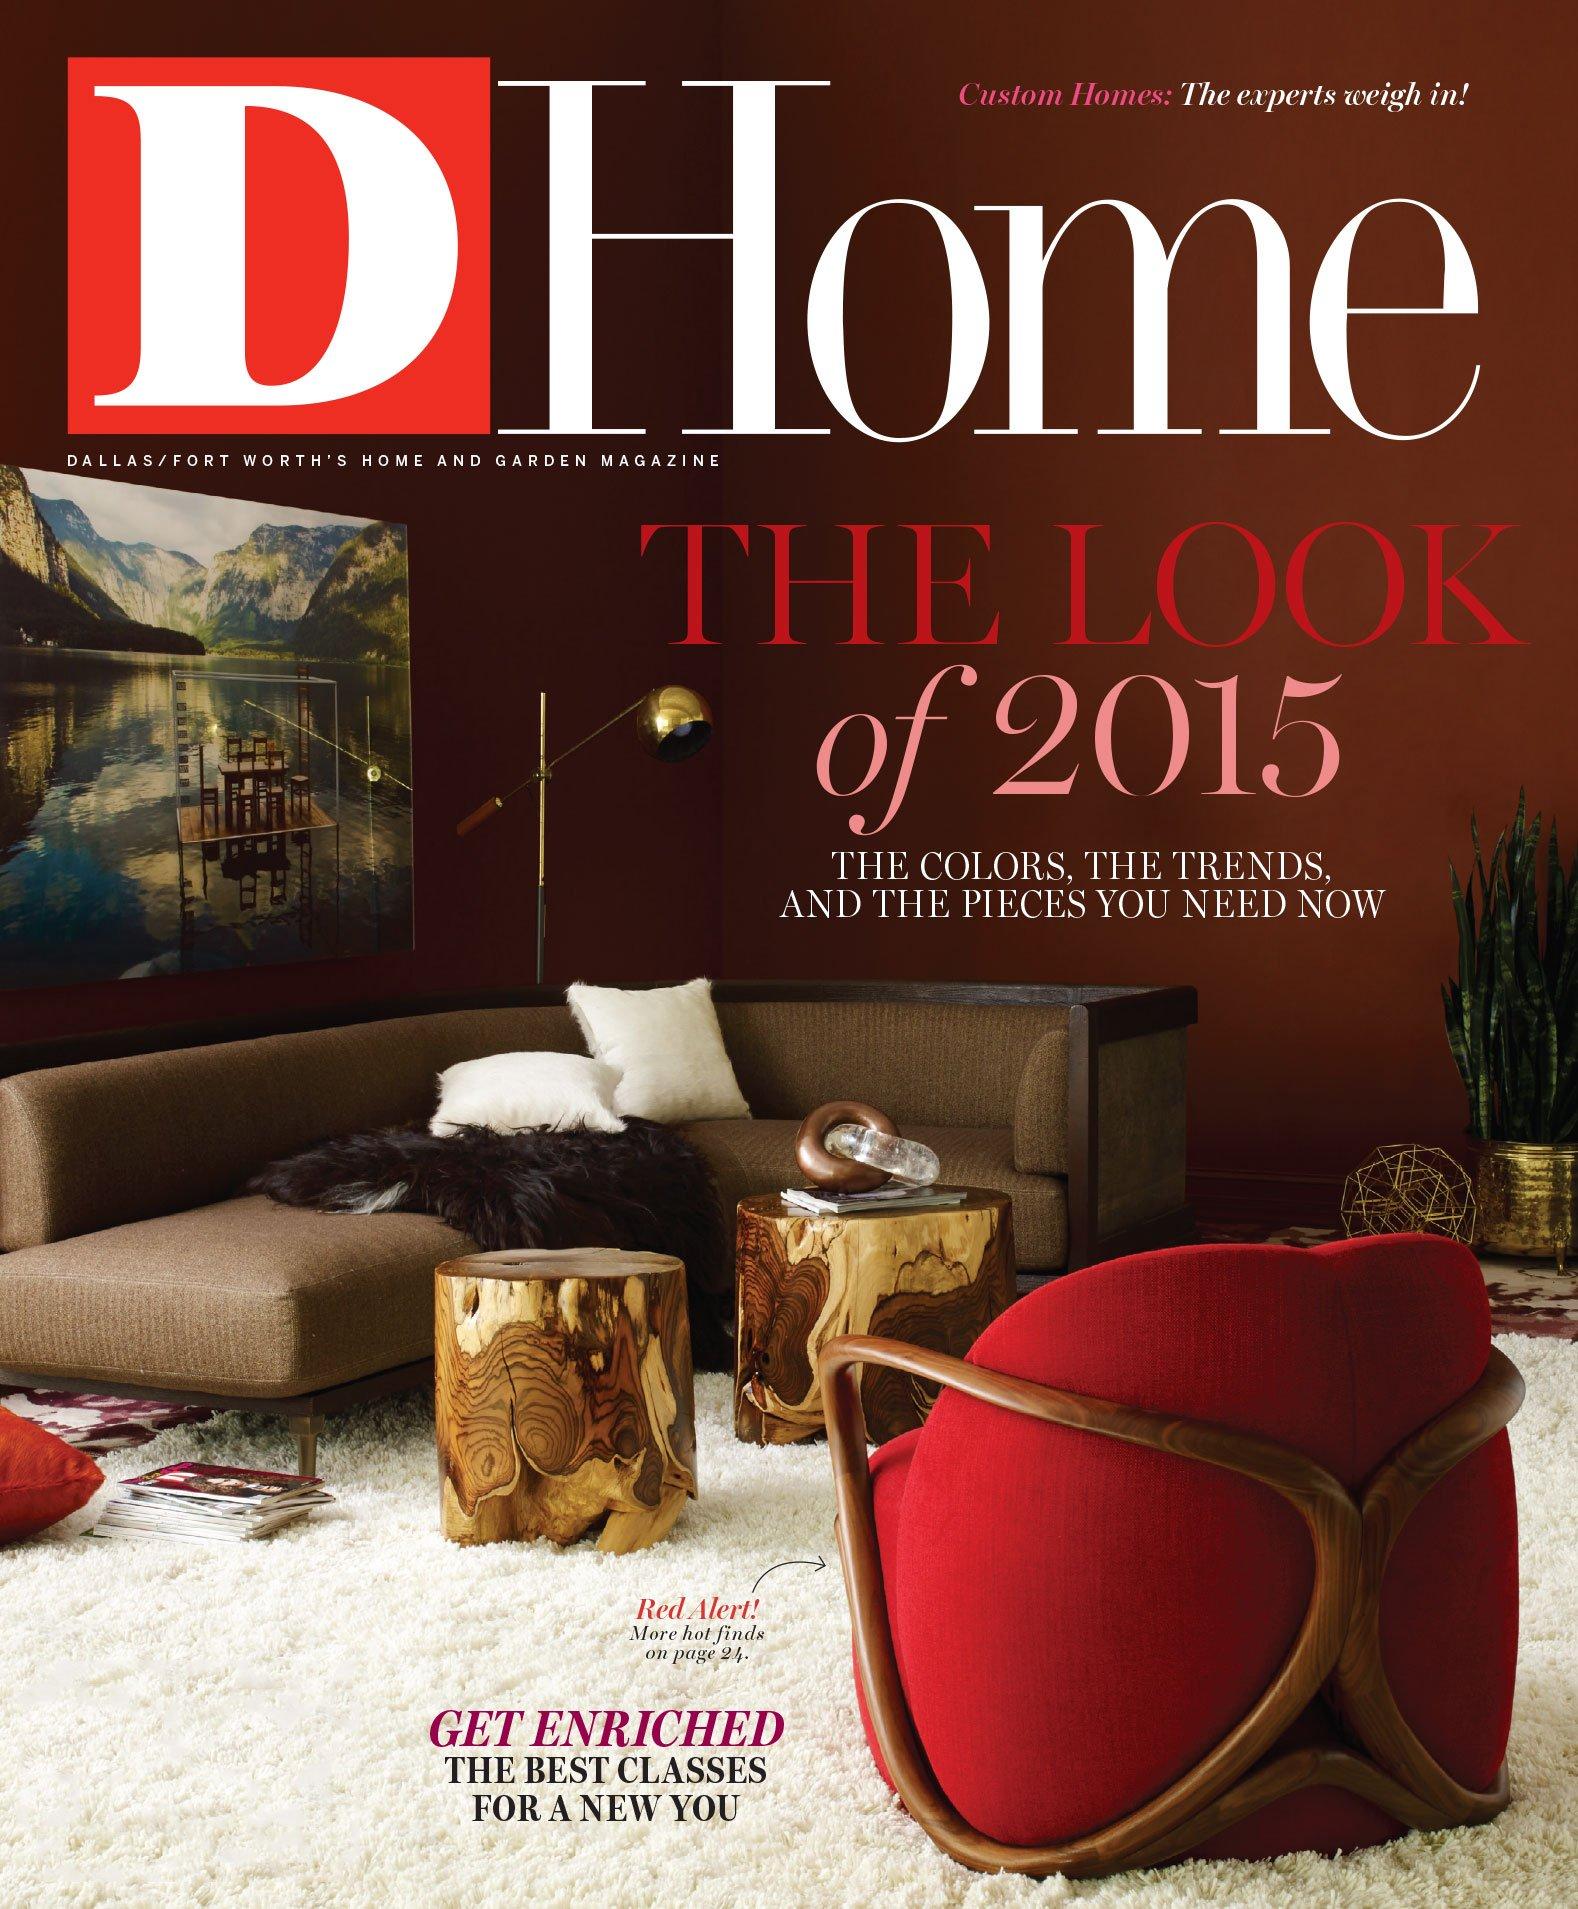 January-February 2015 cover